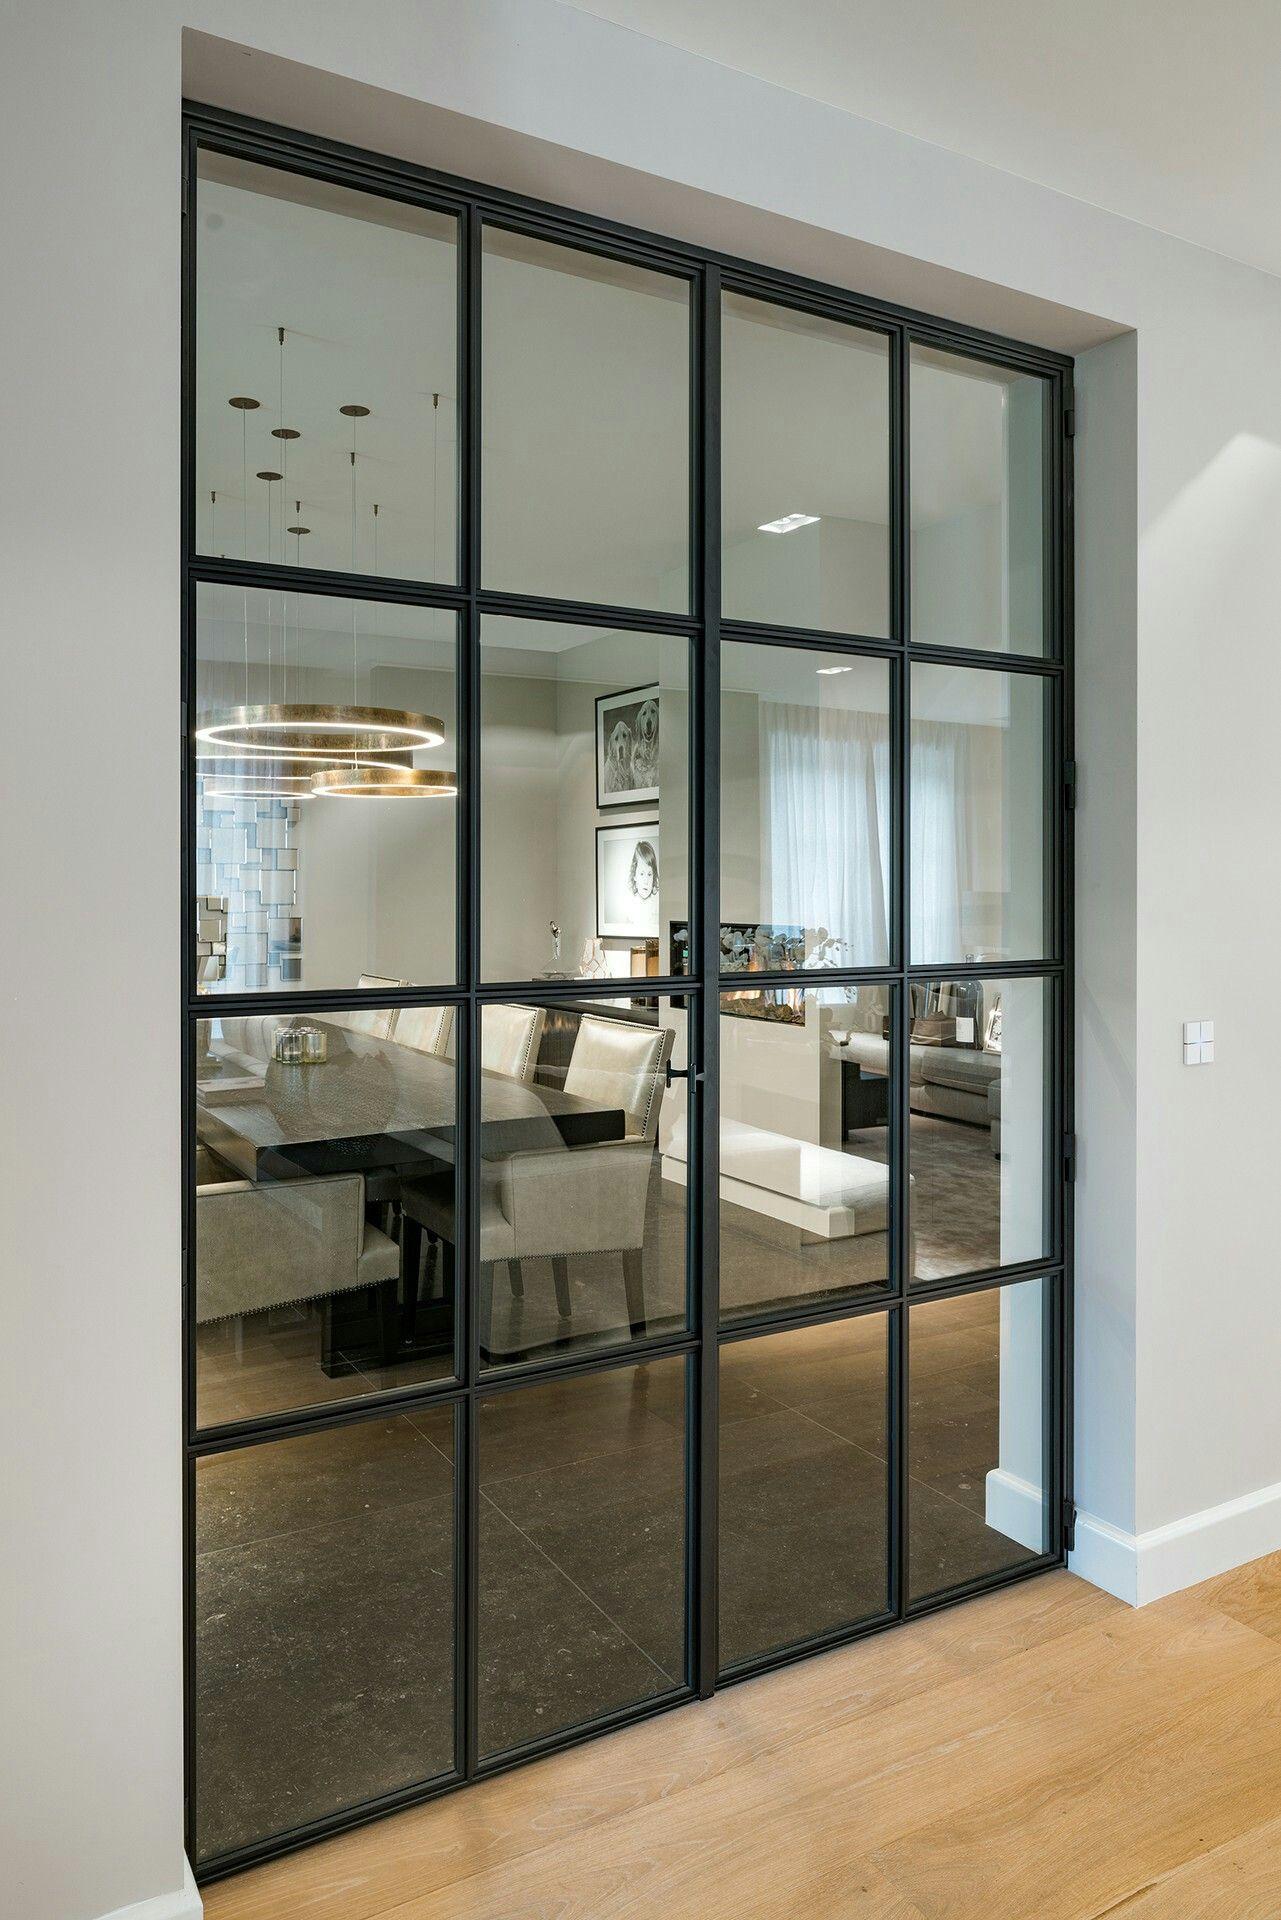 Pin Von Maria Aviles Auf Huis Haus Design Haus Innenarchitektur Haus Innenraume